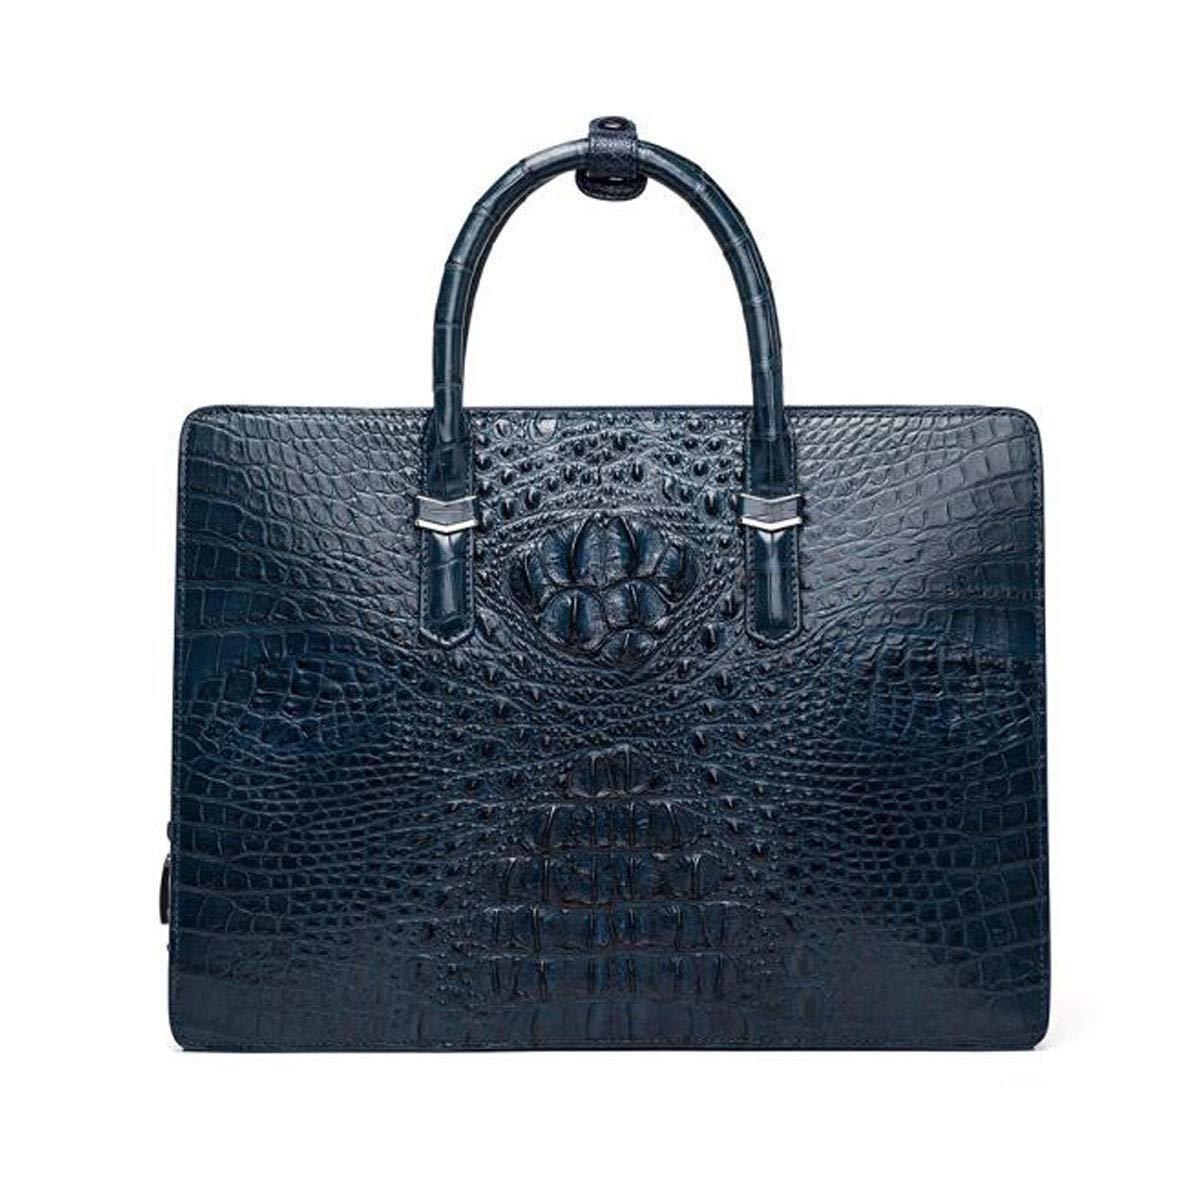 Hengxiang メッセンジャーバッグ、ラップトップブリーフケース、メンズメッセンジャーバッグ、メンズ弁護士バッグ、レザーコンピュータバッグ、ブラックサイズ:35627cm ビジネスオフィスメッセンジャーバッグ(色:ブルー)   B07PBVGHTF